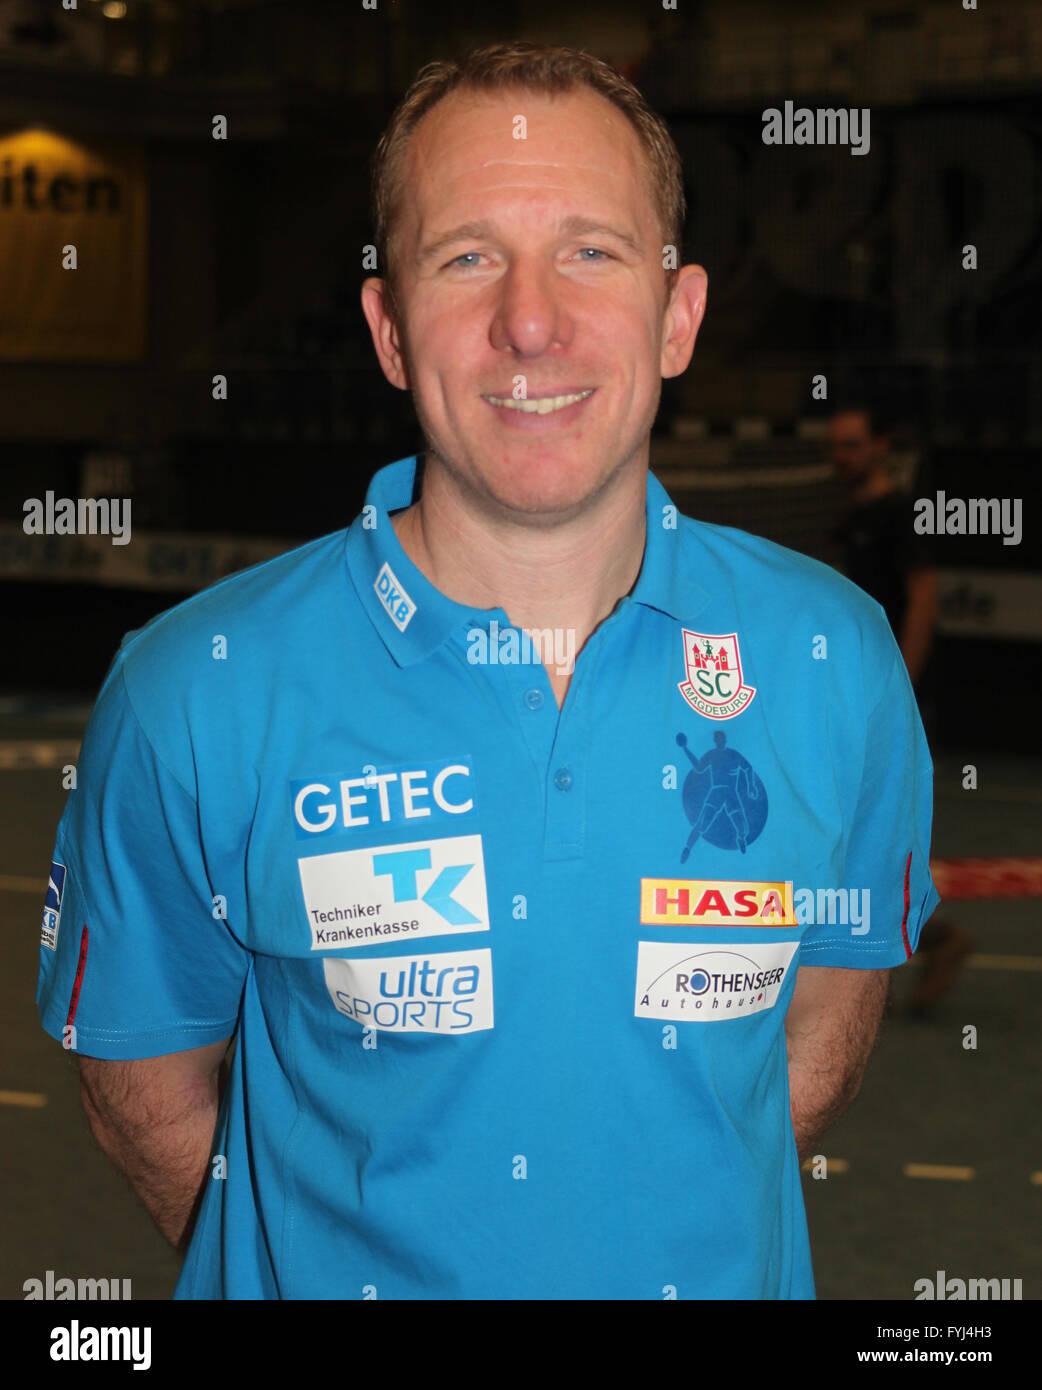 Frank Carstens (SC Magdeburg Saison 2013/14) - Stock Image